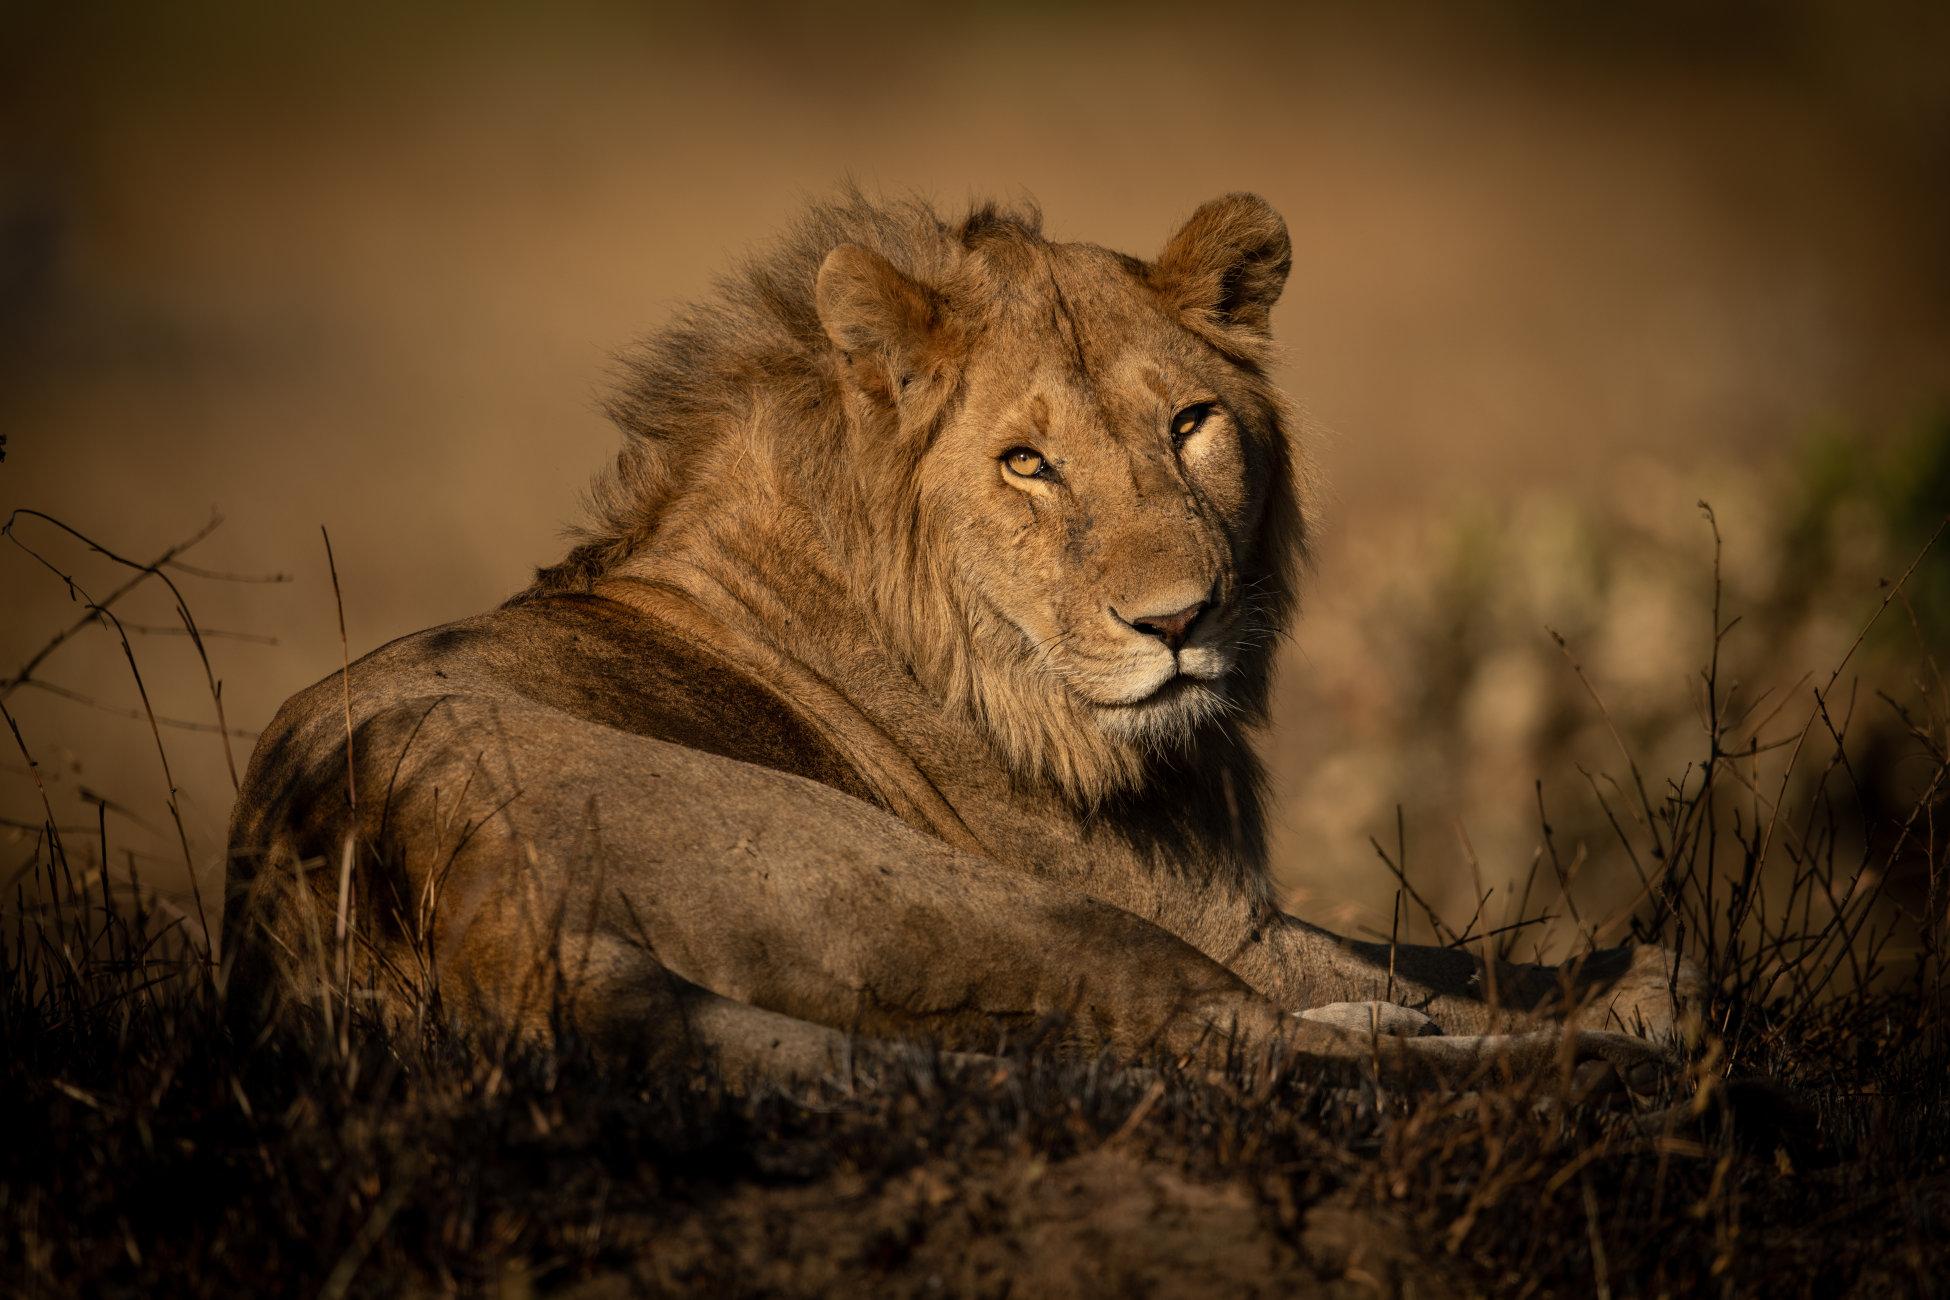 Male lion lies in grass eyeing camera